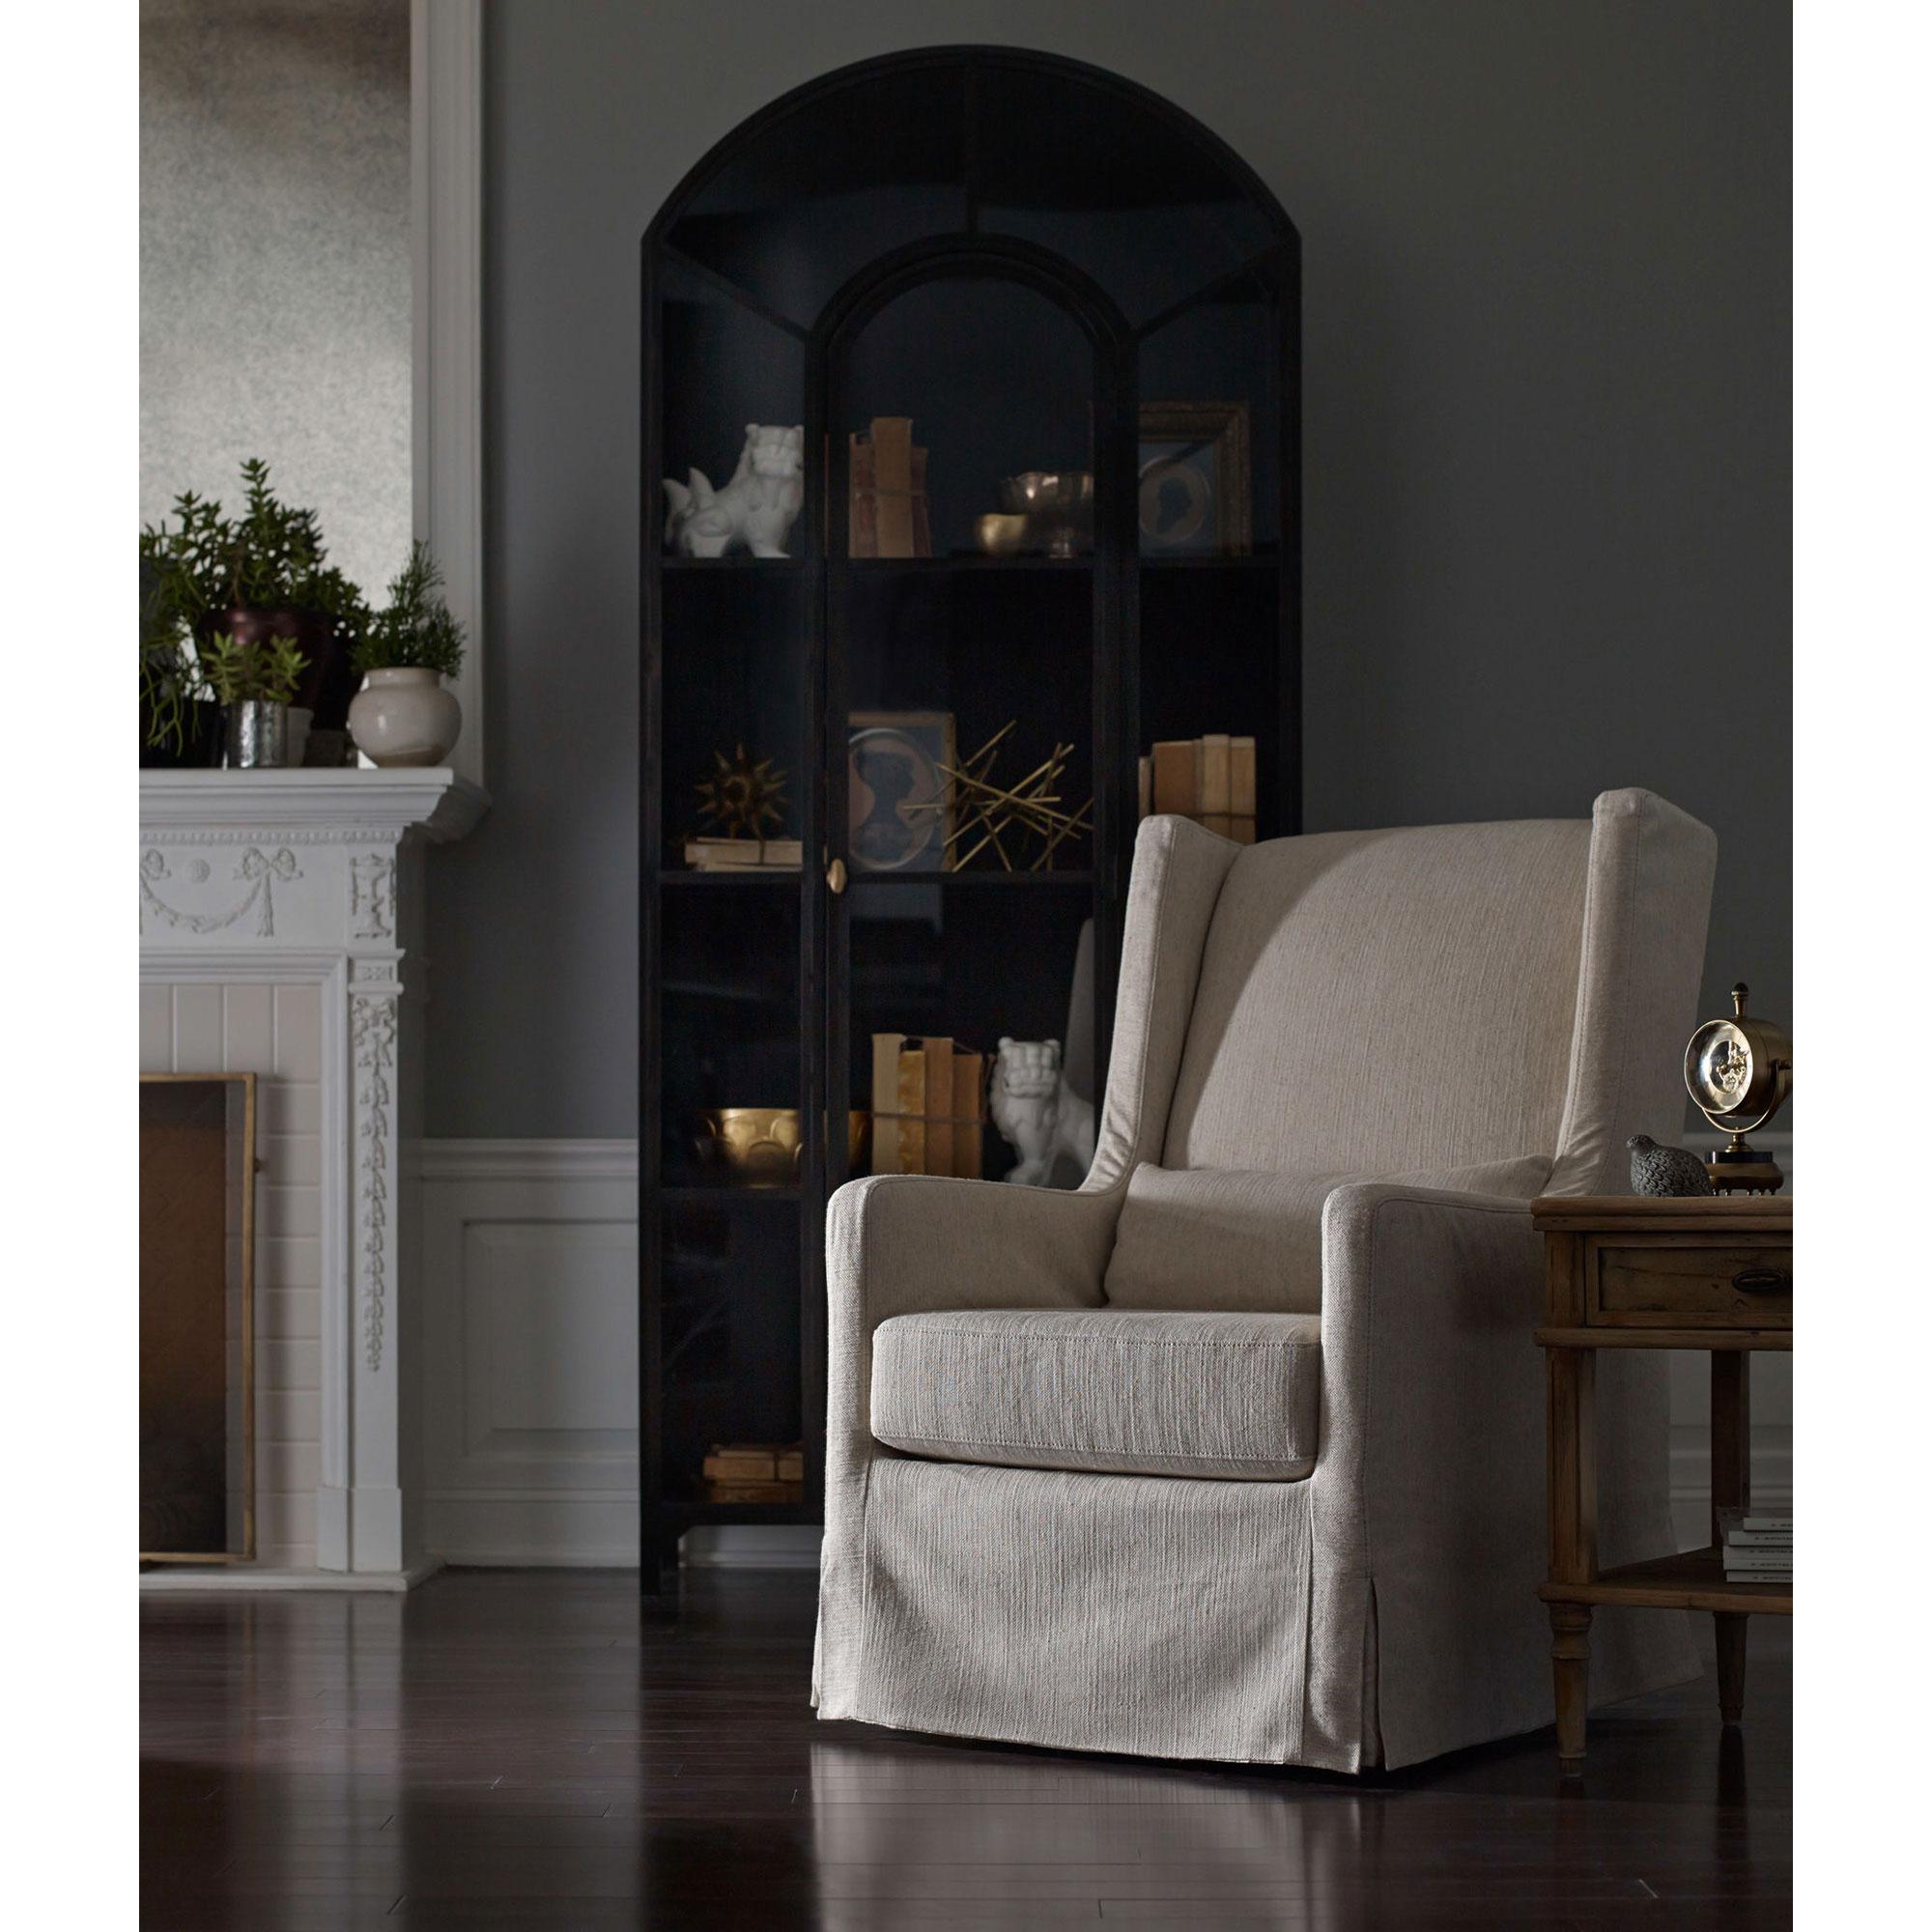 Stancil Industrial Loft Matte Black Iron Arched Cabinet